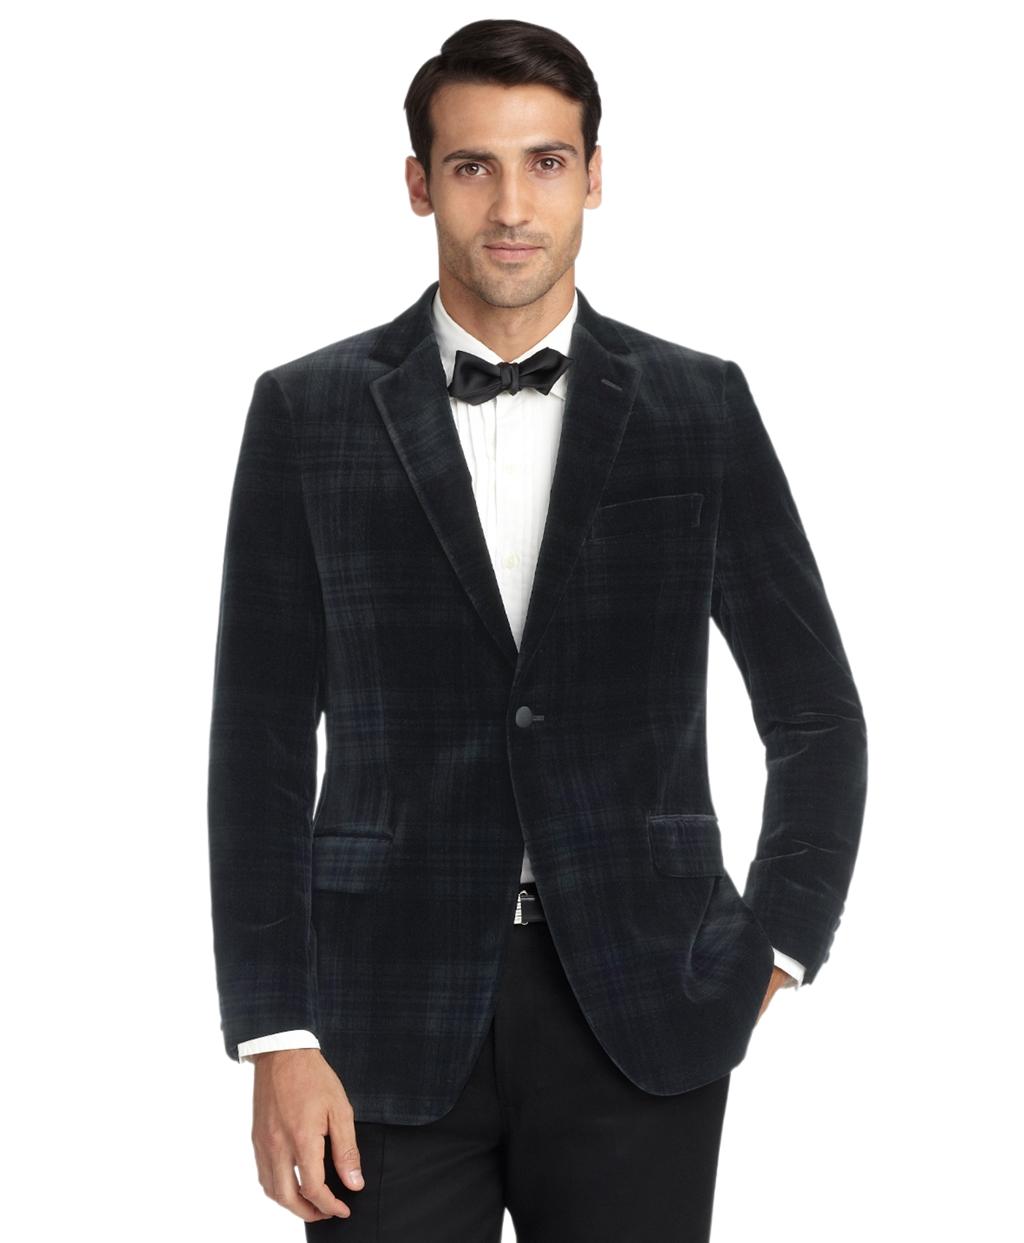 New Vintage Tuxedos, Tailcoats, Morning Suits, Dinner Jackets Brooks Brothers Mens Fitzgerald Fit Velvet Blackwatch Tuxedo Jacket $898.00 AT vintagedancer.com